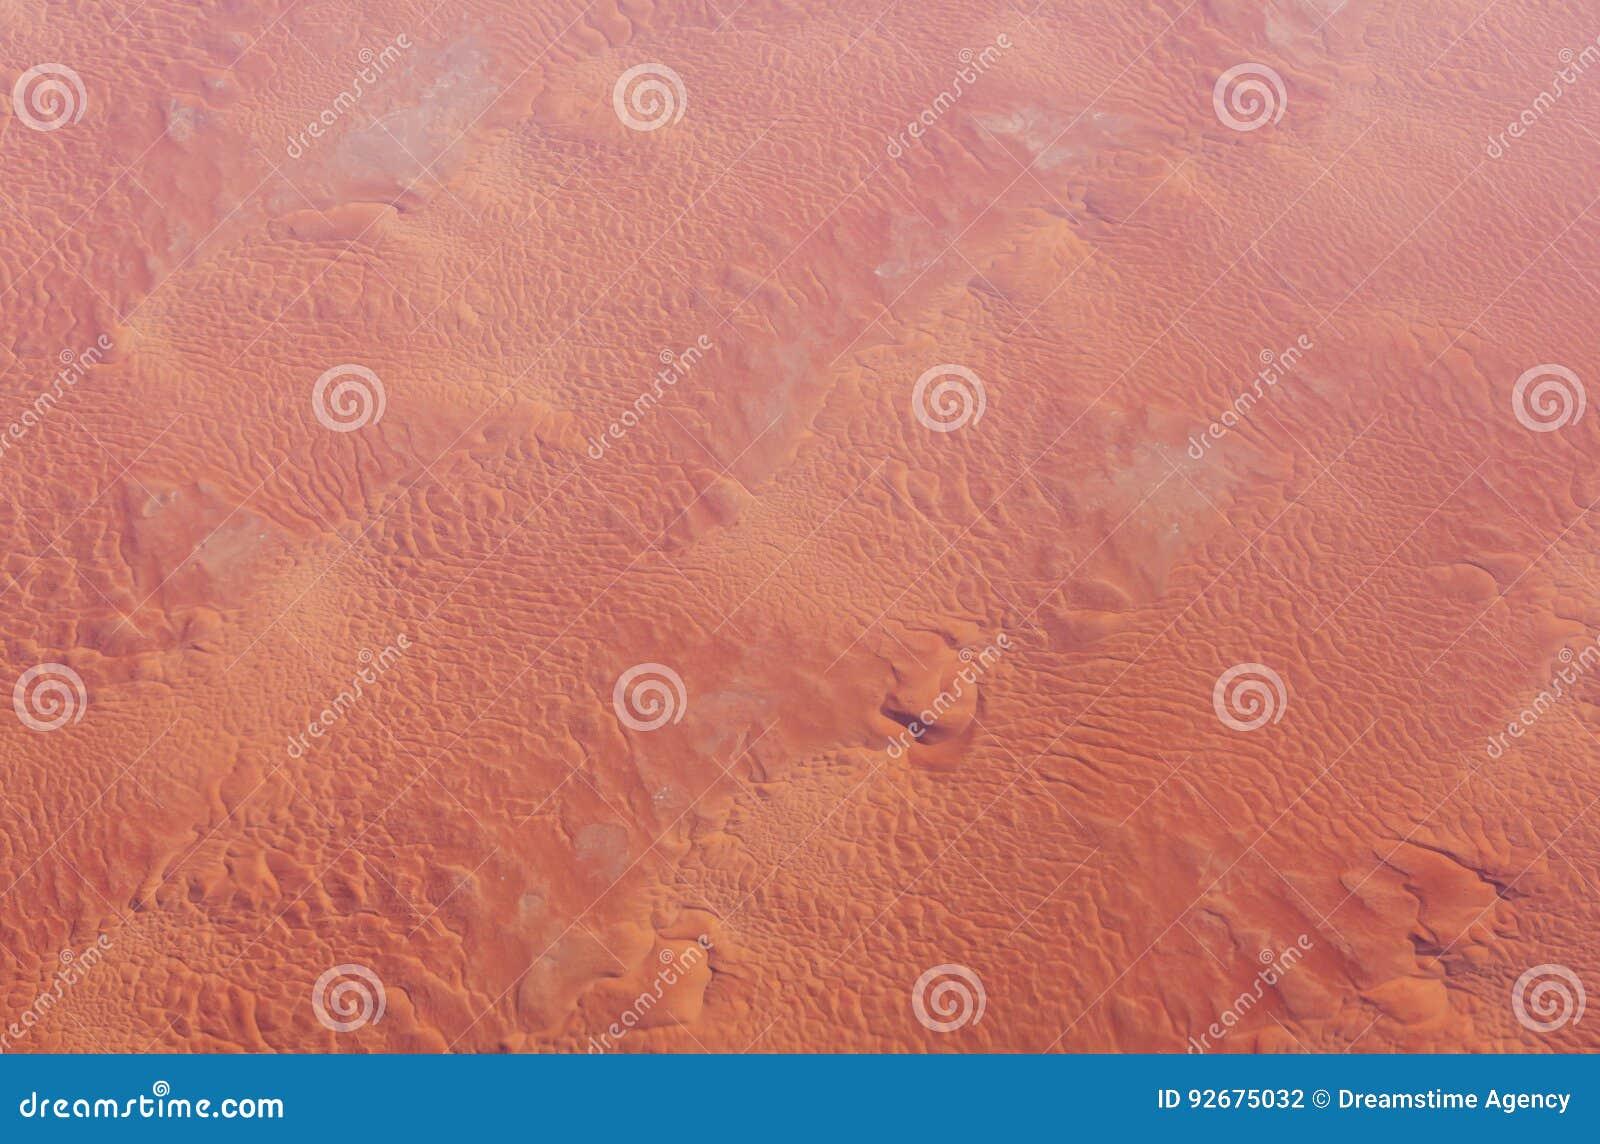 Desert coming